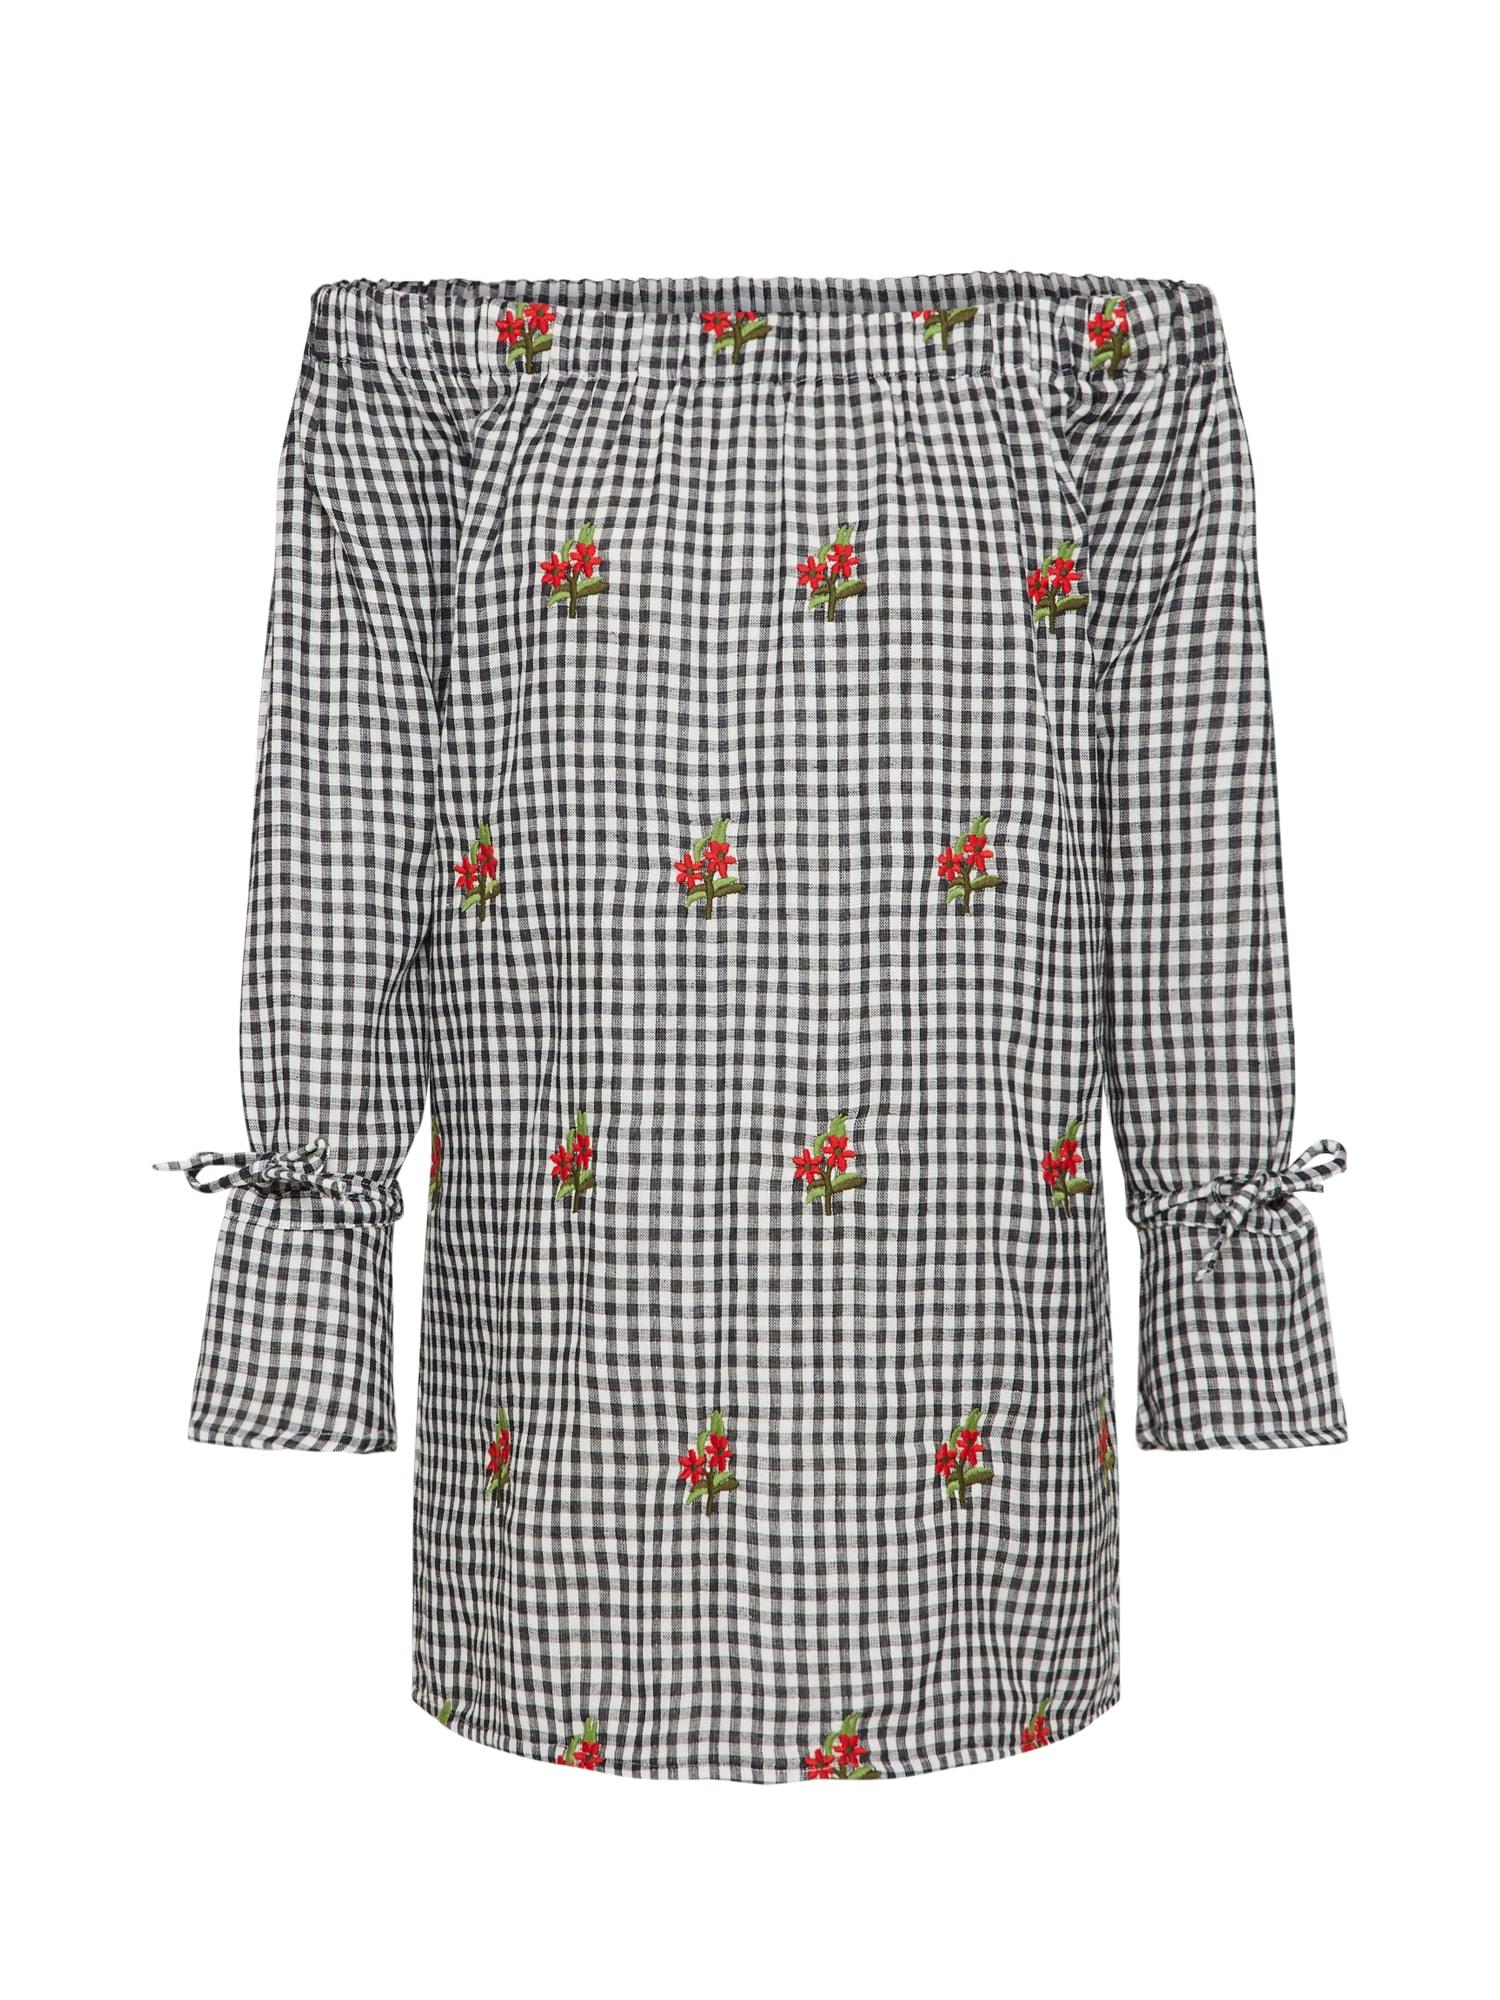 Šaty Rita Gingham Embroidered Shift černá bílá Boohoo